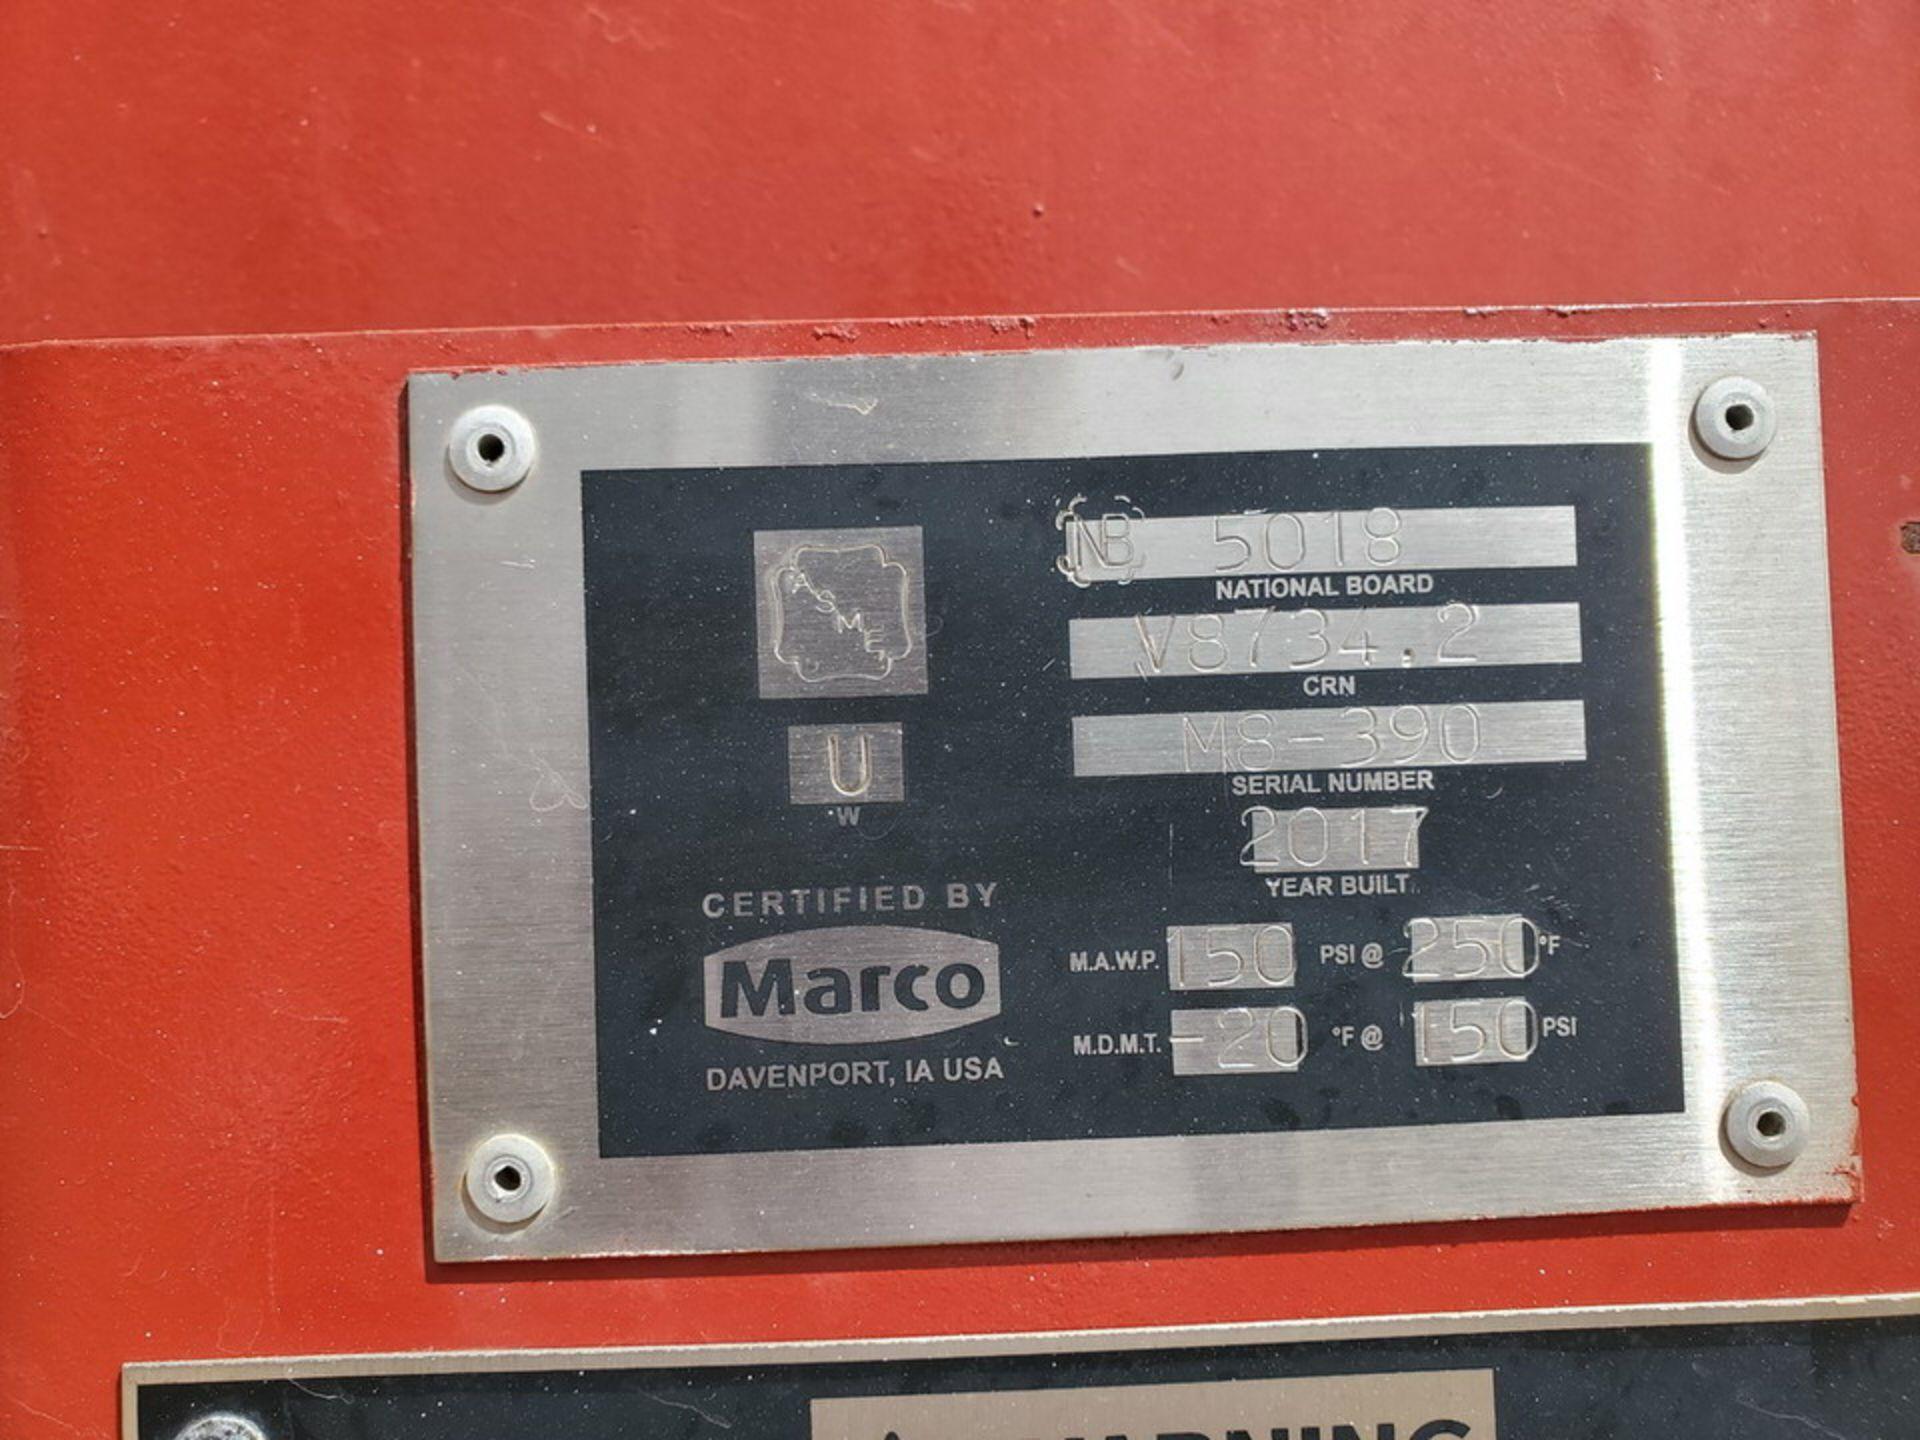 "2017 Marco Sand Blast Master Portable Sandblast Unit 150psi@250F, -20F@150psi, Vessel Dims: 48"" Seam - Image 15 of 18"